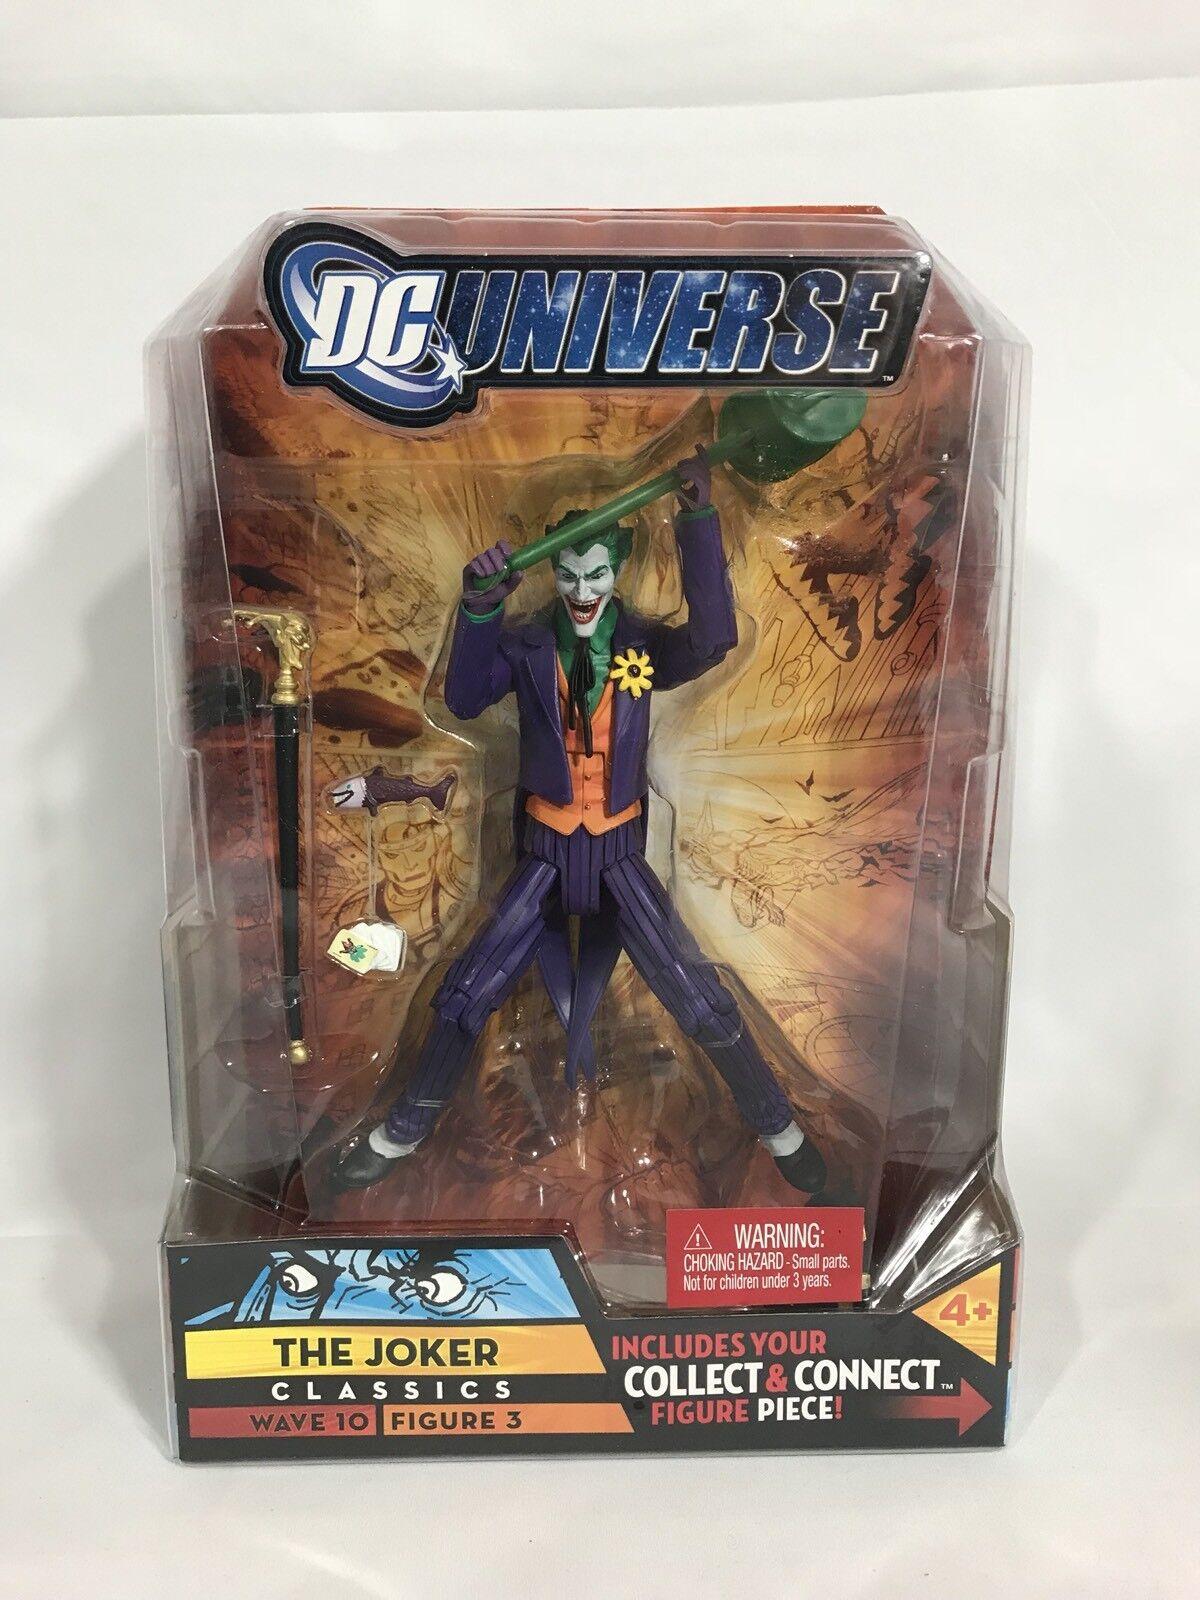 DC Universe DCUC Classics Joker Wave 10 Walmart Exclusive Brand new - NIB